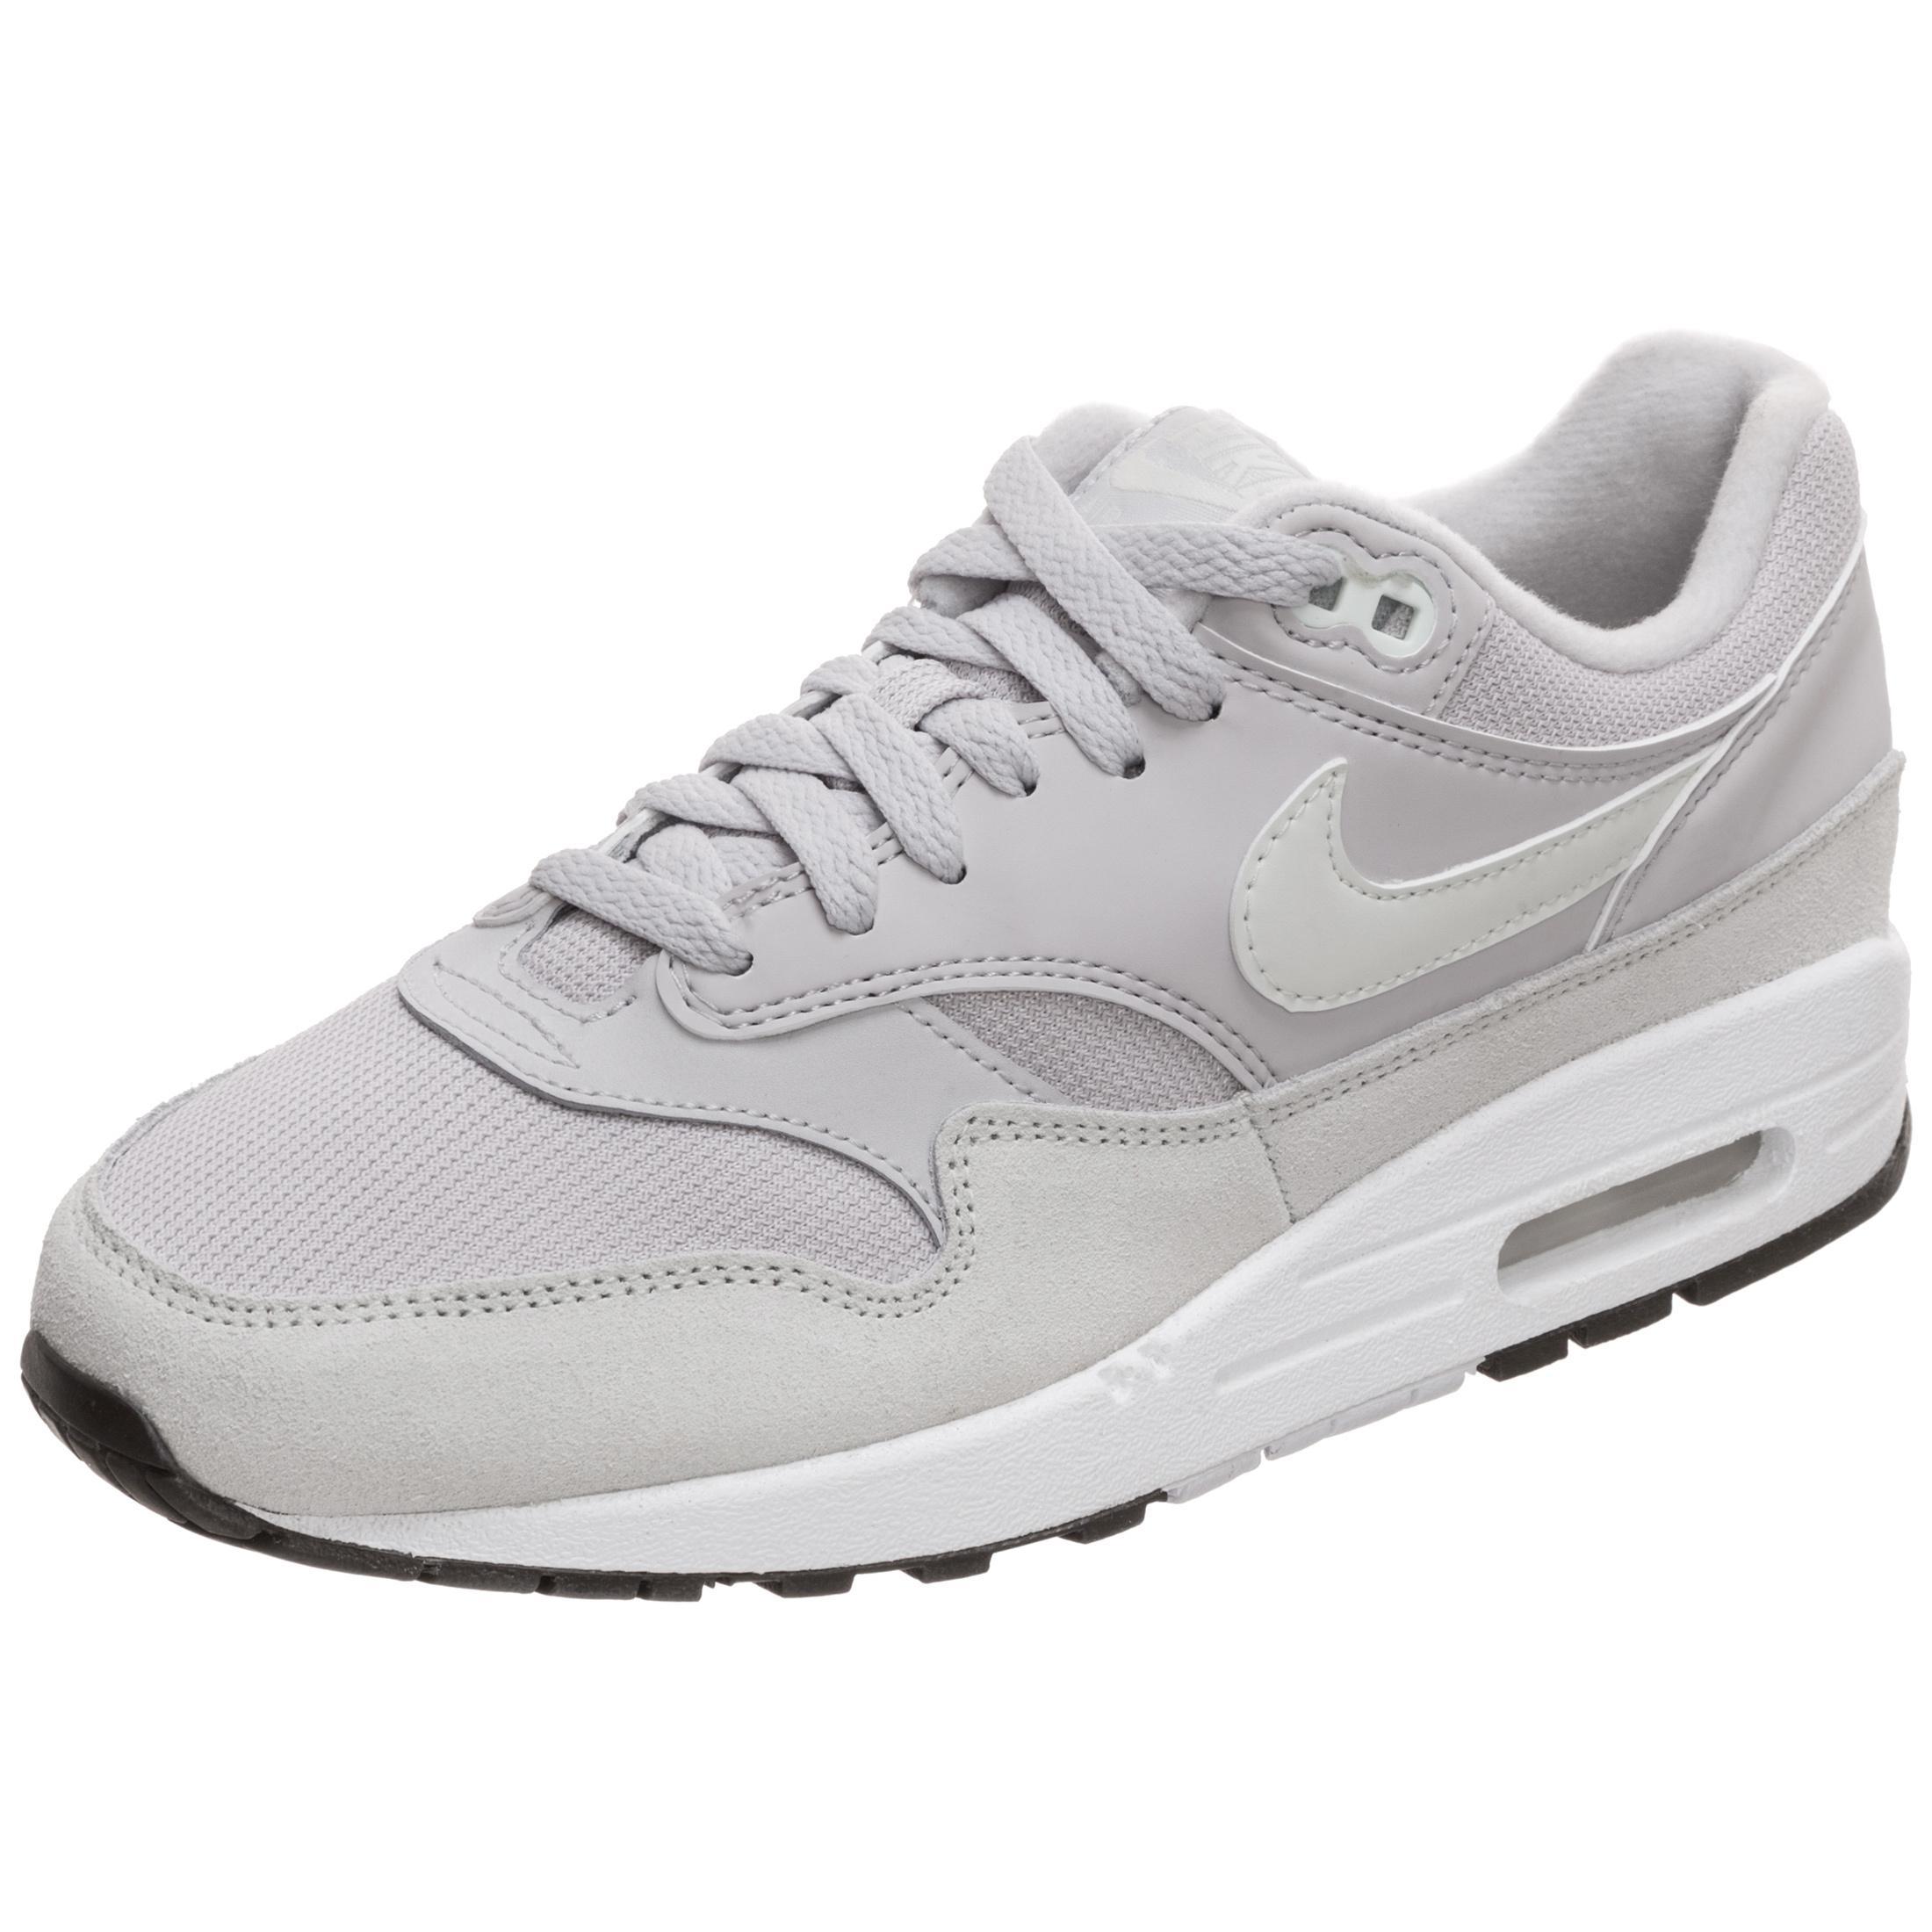 Nike – Air Max 1 – Hochwertige Sneaker in Rosa und Grau